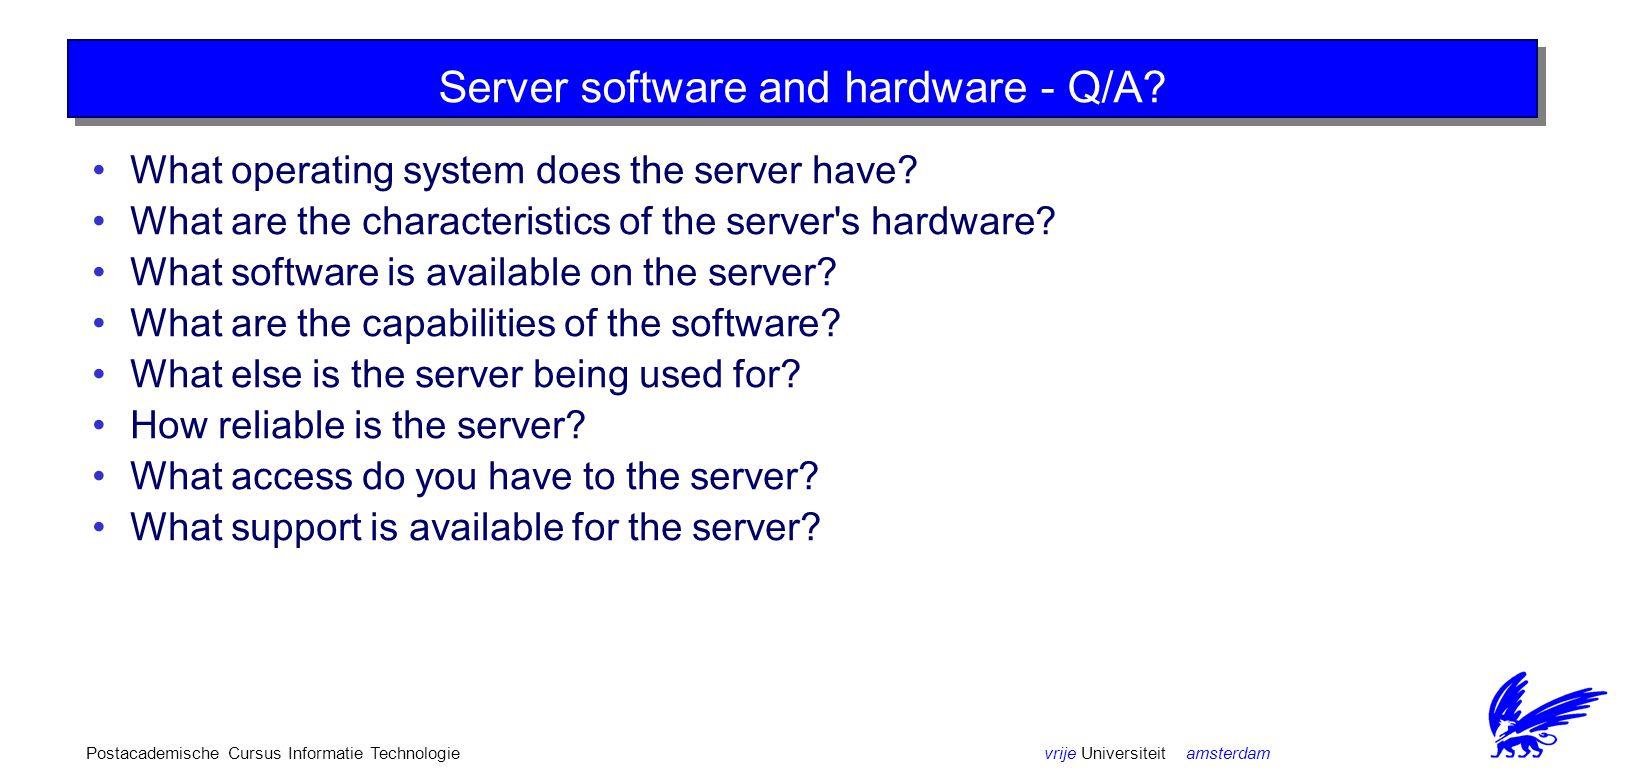 vrije Universiteit amsterdamPostacademische Cursus Informatie Technologie Client software and hardware - Q/A? What client operating system is being us